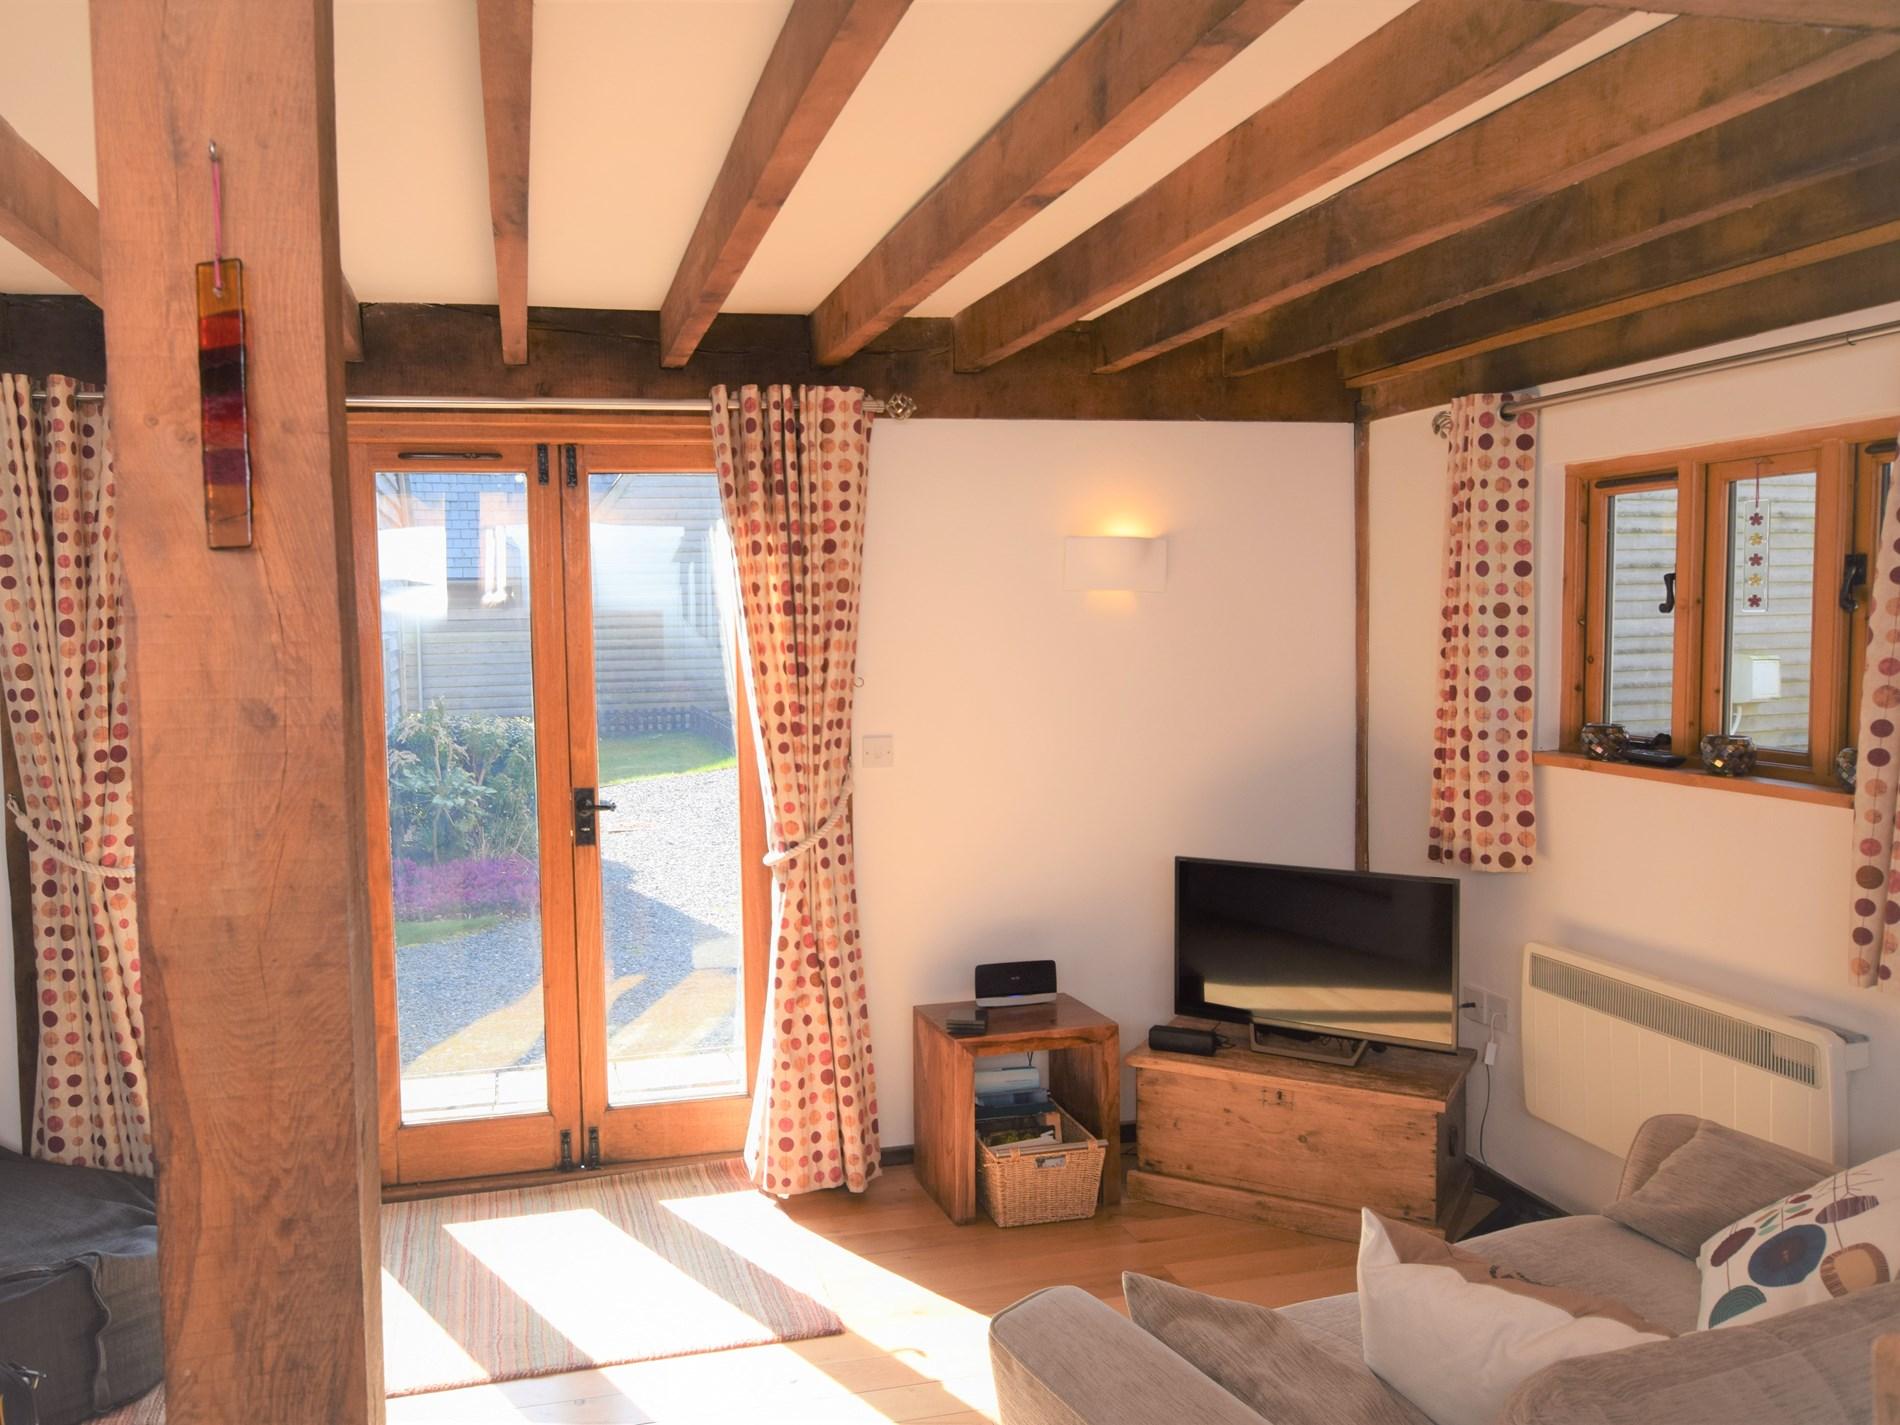 3 Bedroom Log Cabin in North Cornwall, Cornwall